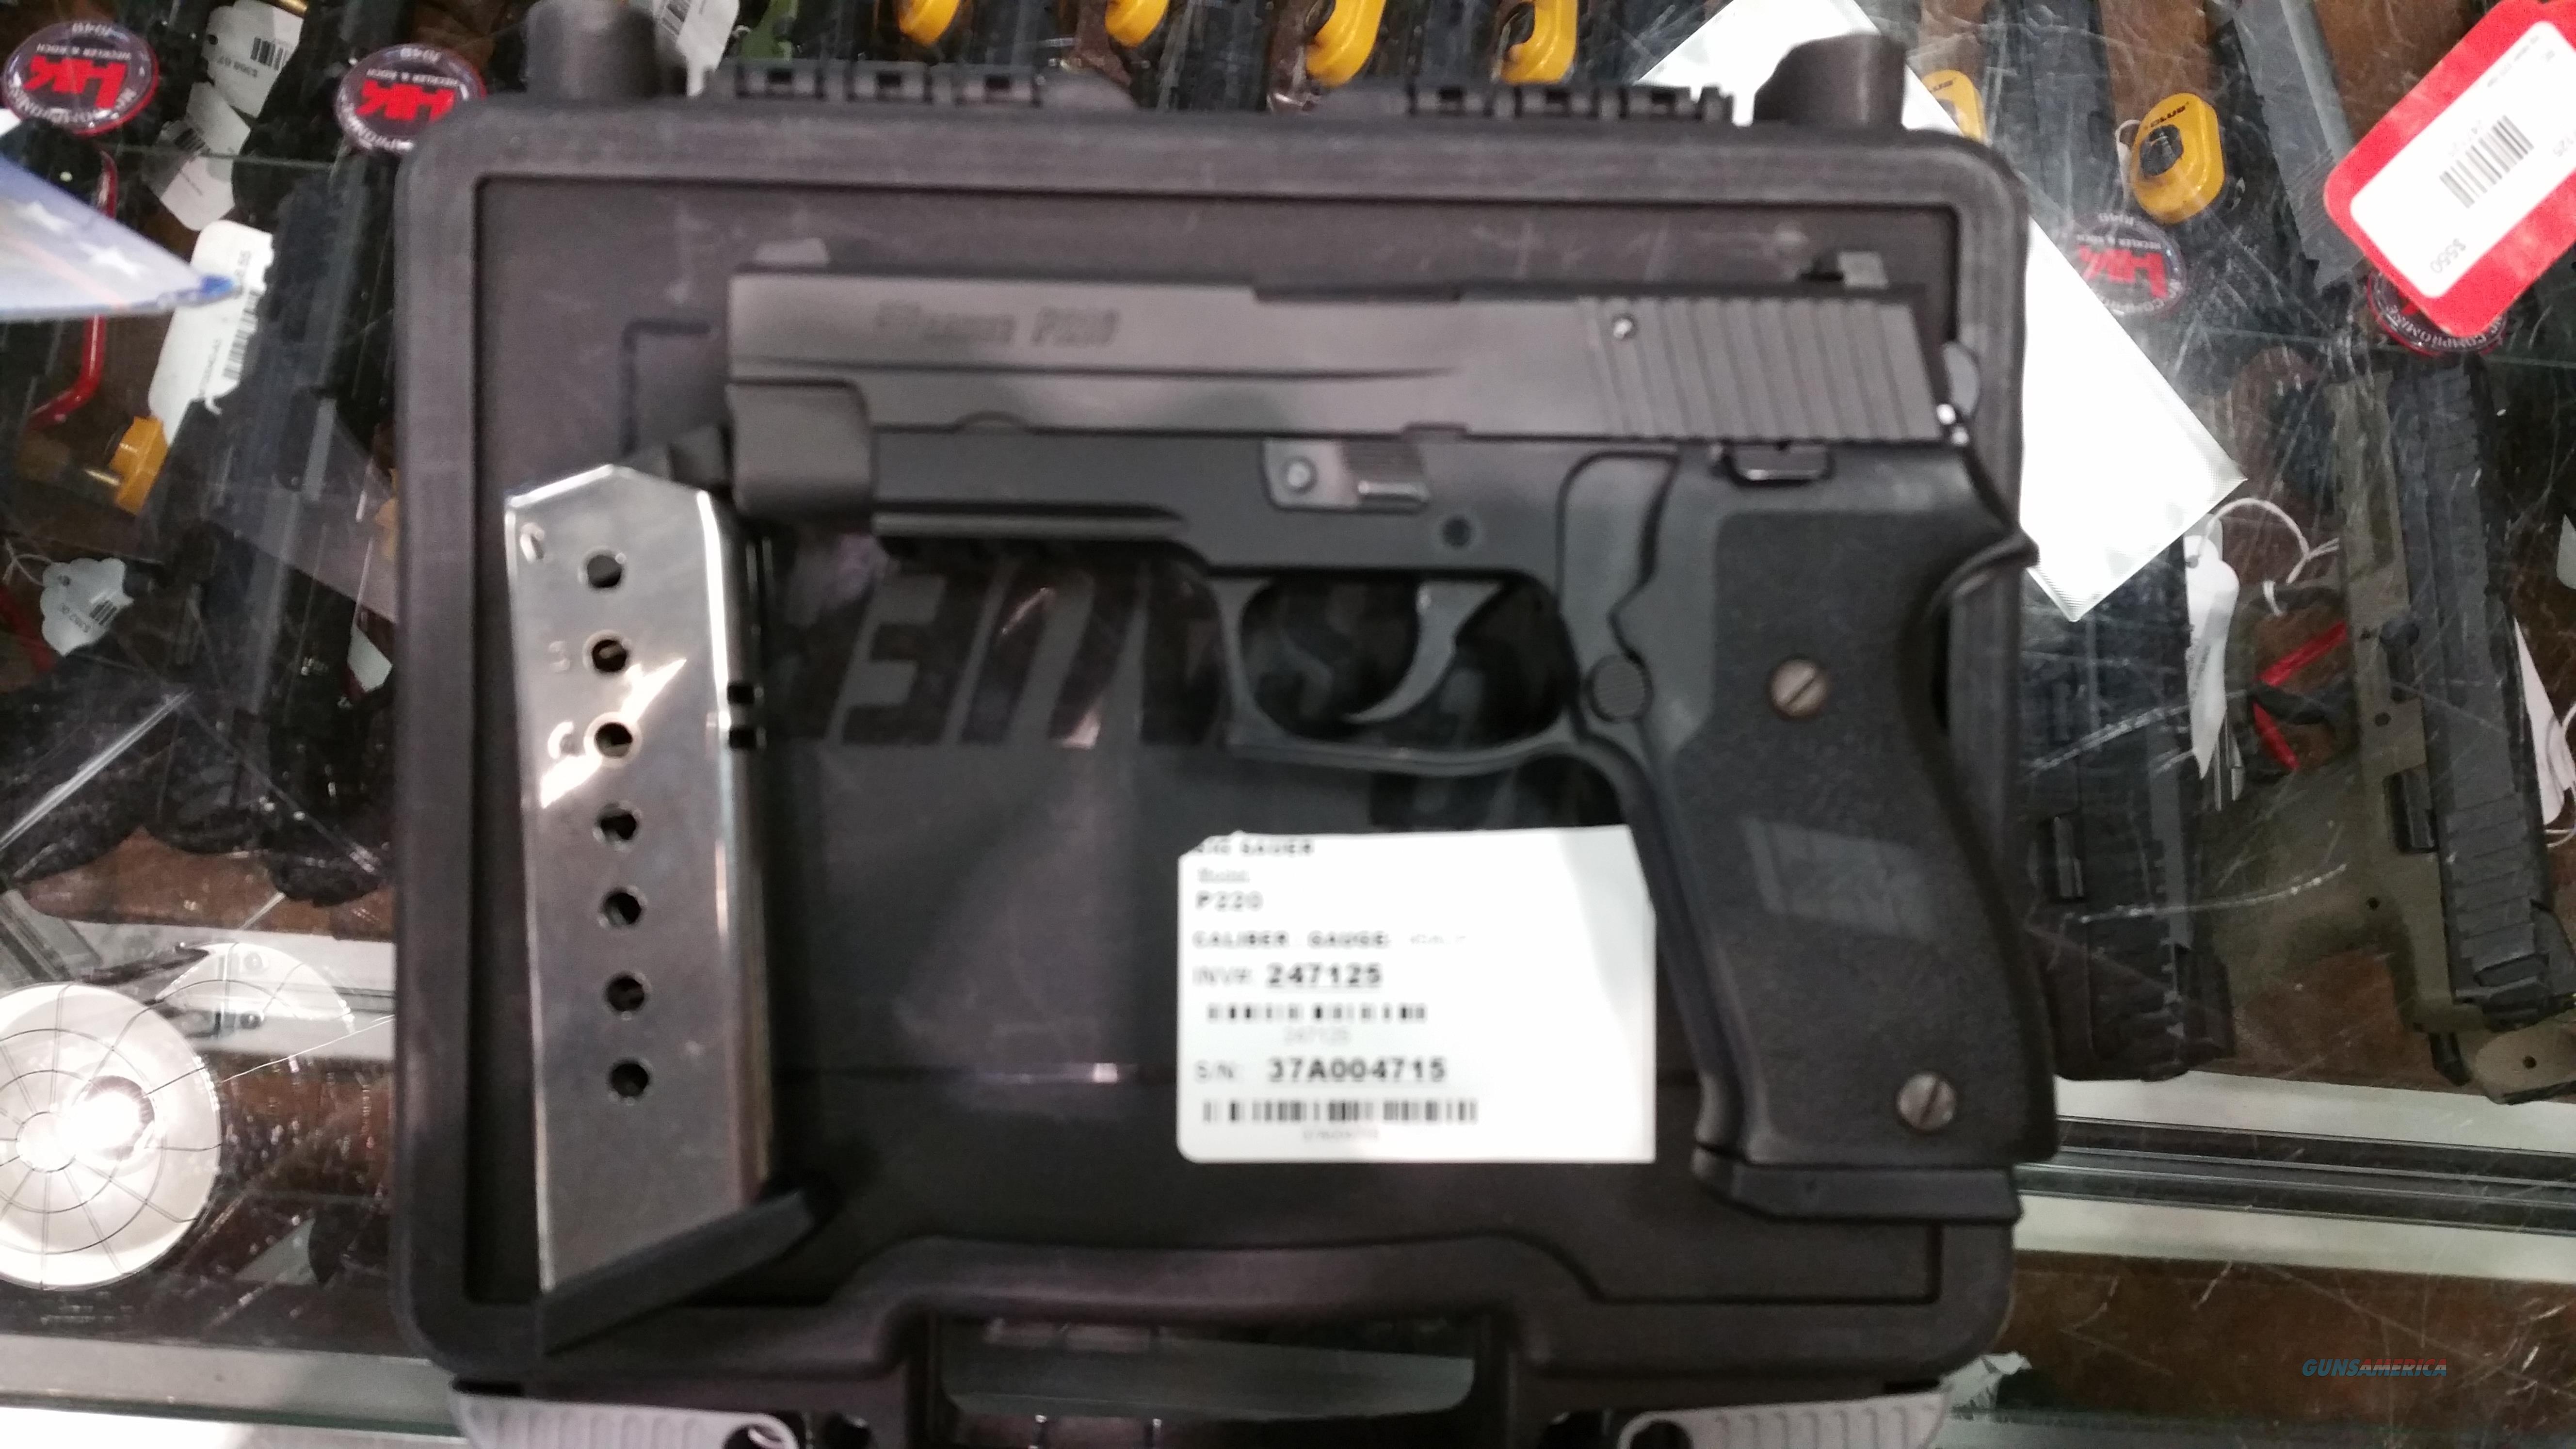 Sig Sauer P220 DAK .45 ACP  Guns > Pistols > Sig - Sauer/Sigarms Pistols > P220